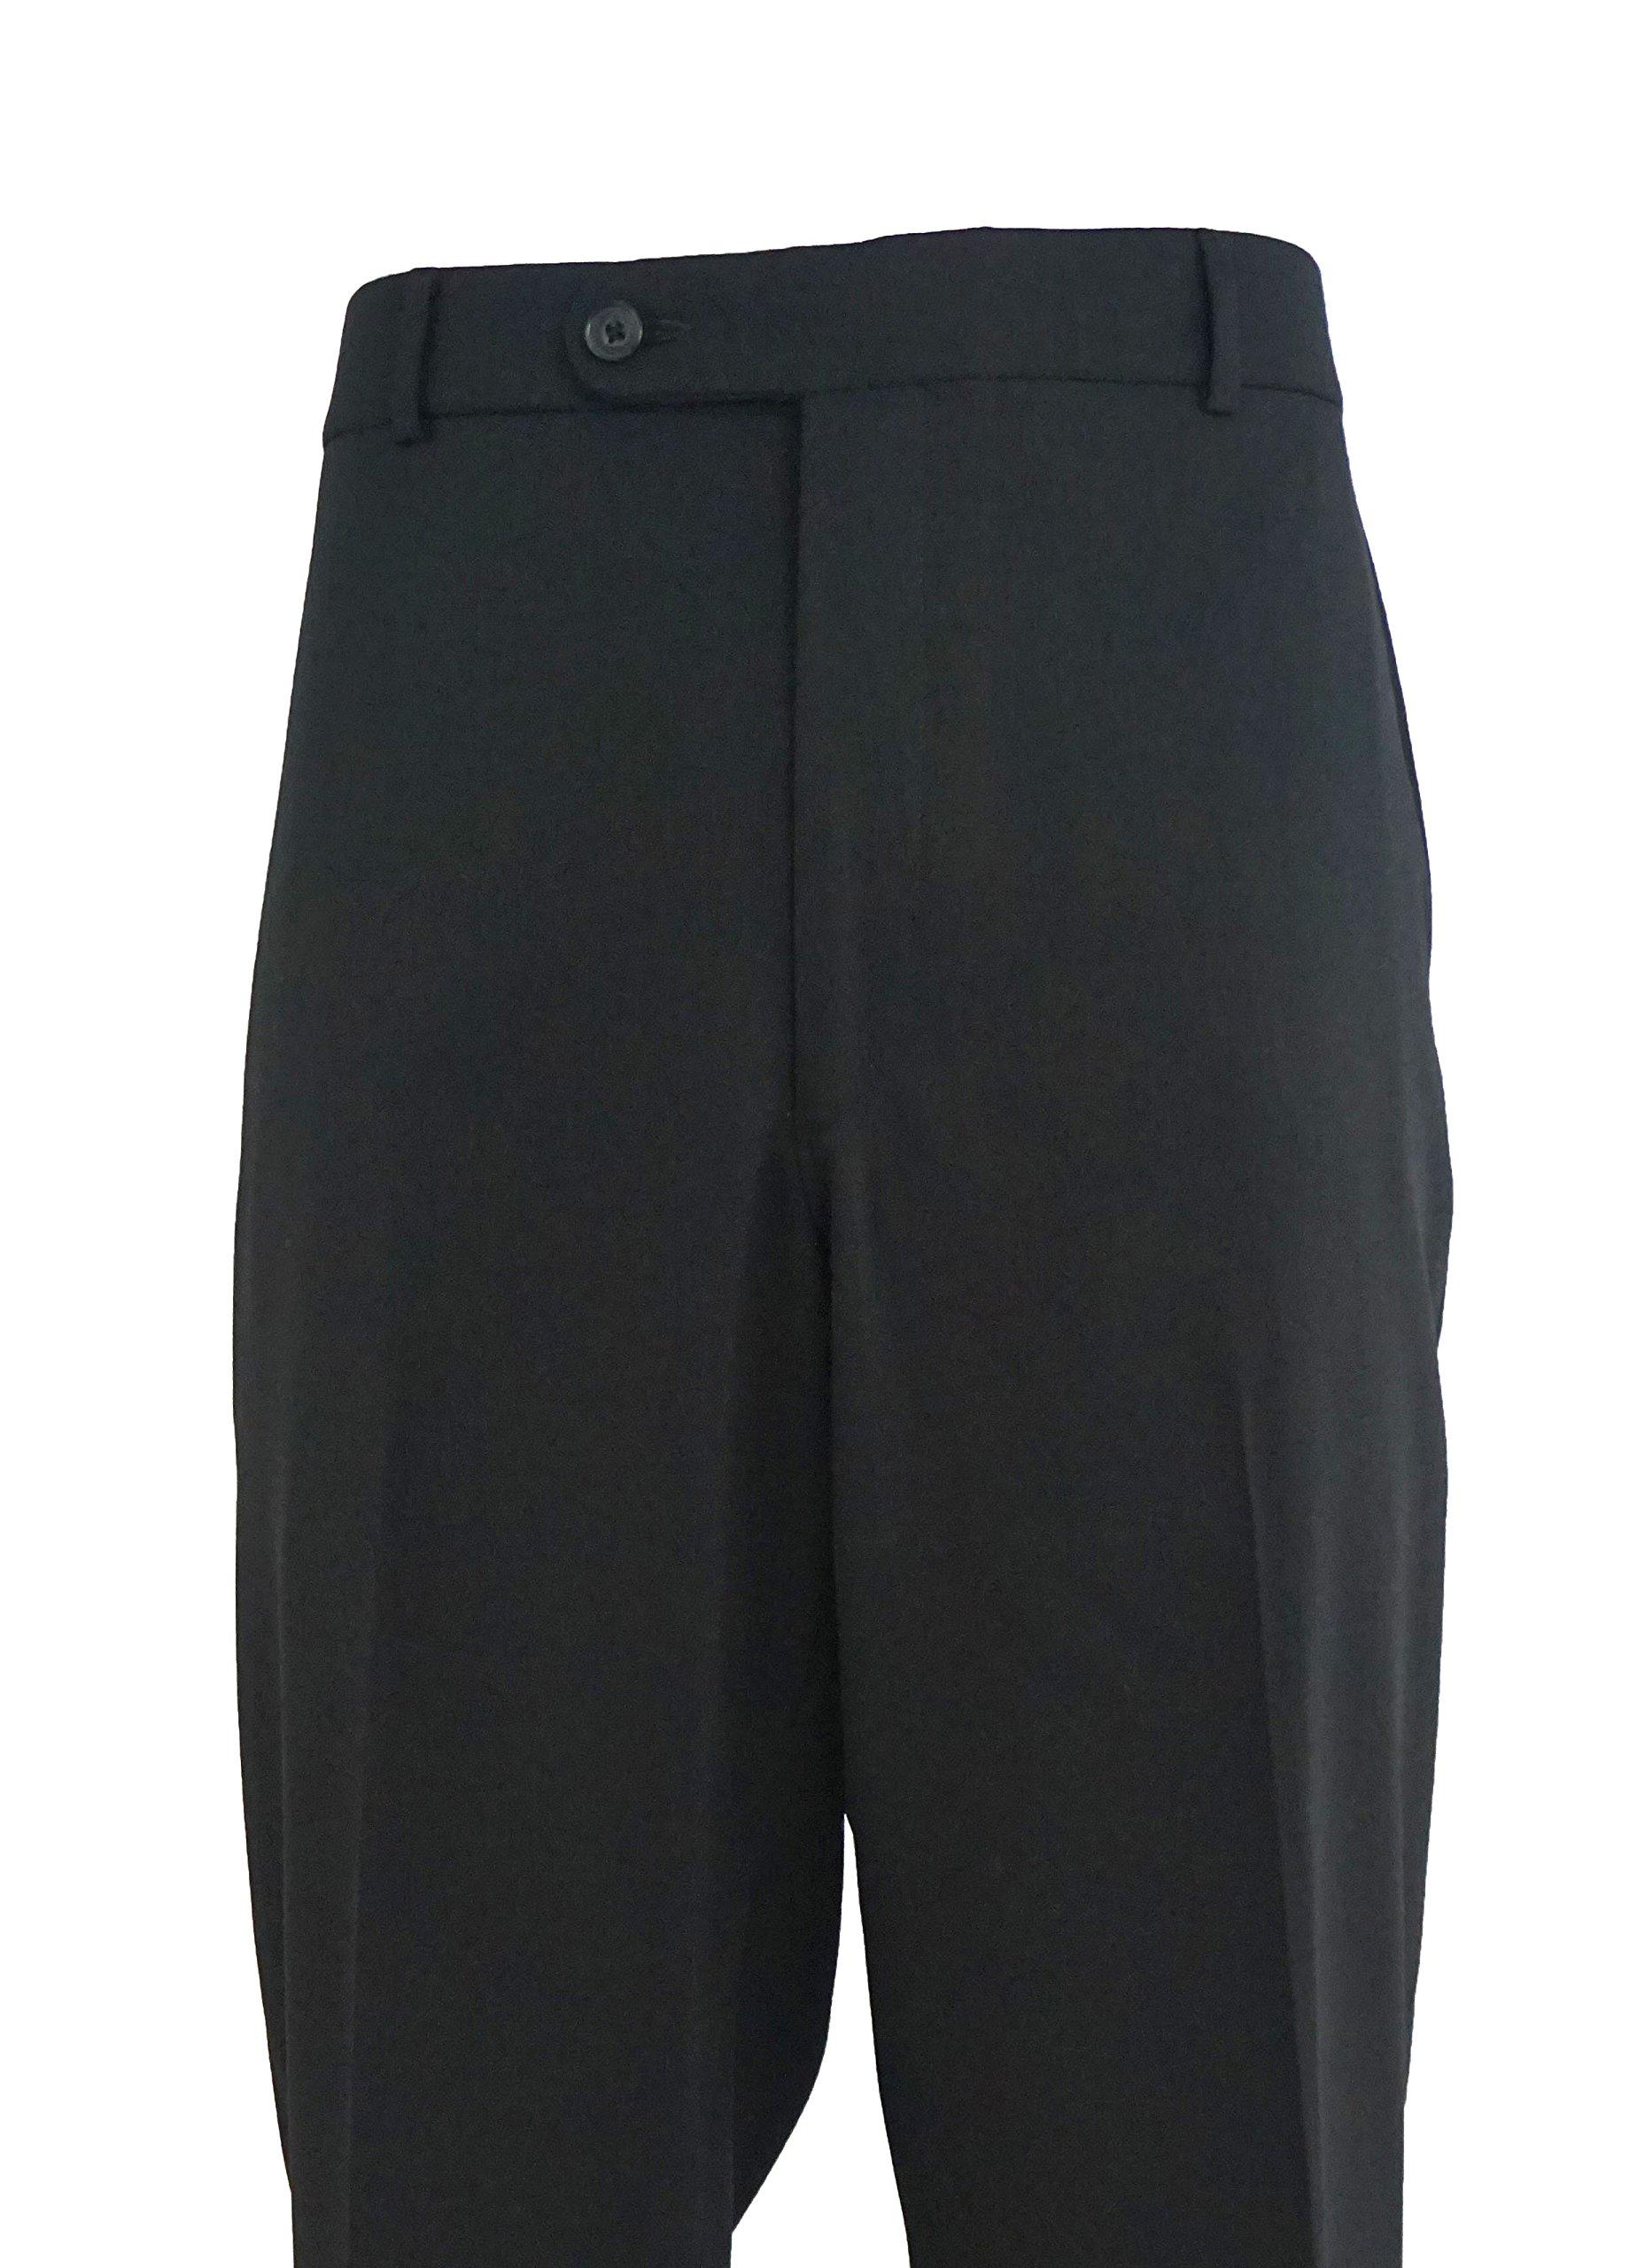 Ballin Comfort-''EZE'' Super 120's Travel Twill 100% wool ''Black'' (W40) by Ballin